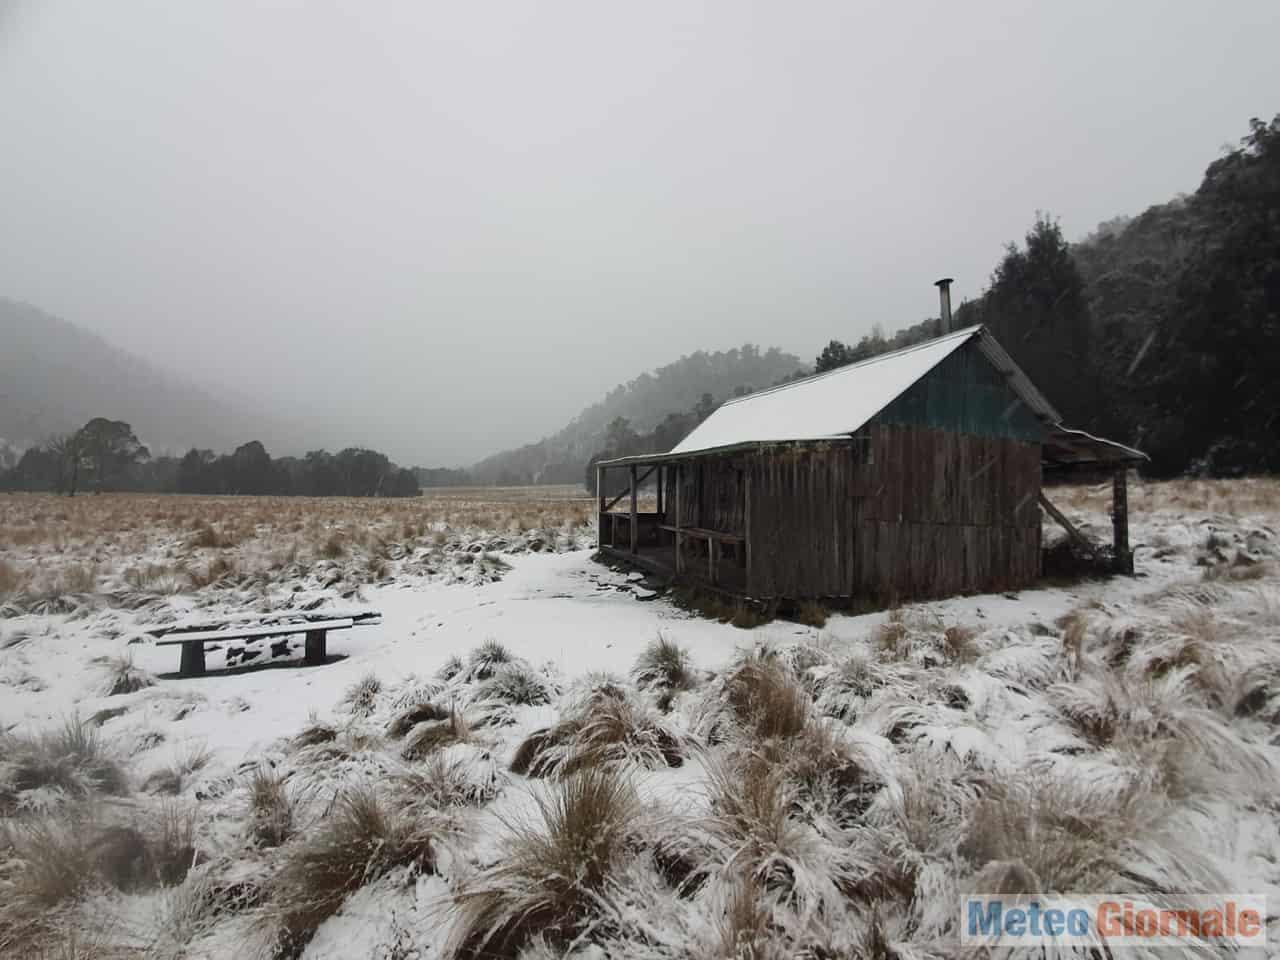 tasmania1 - Magia invernale australe. Meteo con neve fin quasi in pianura in Tasmania